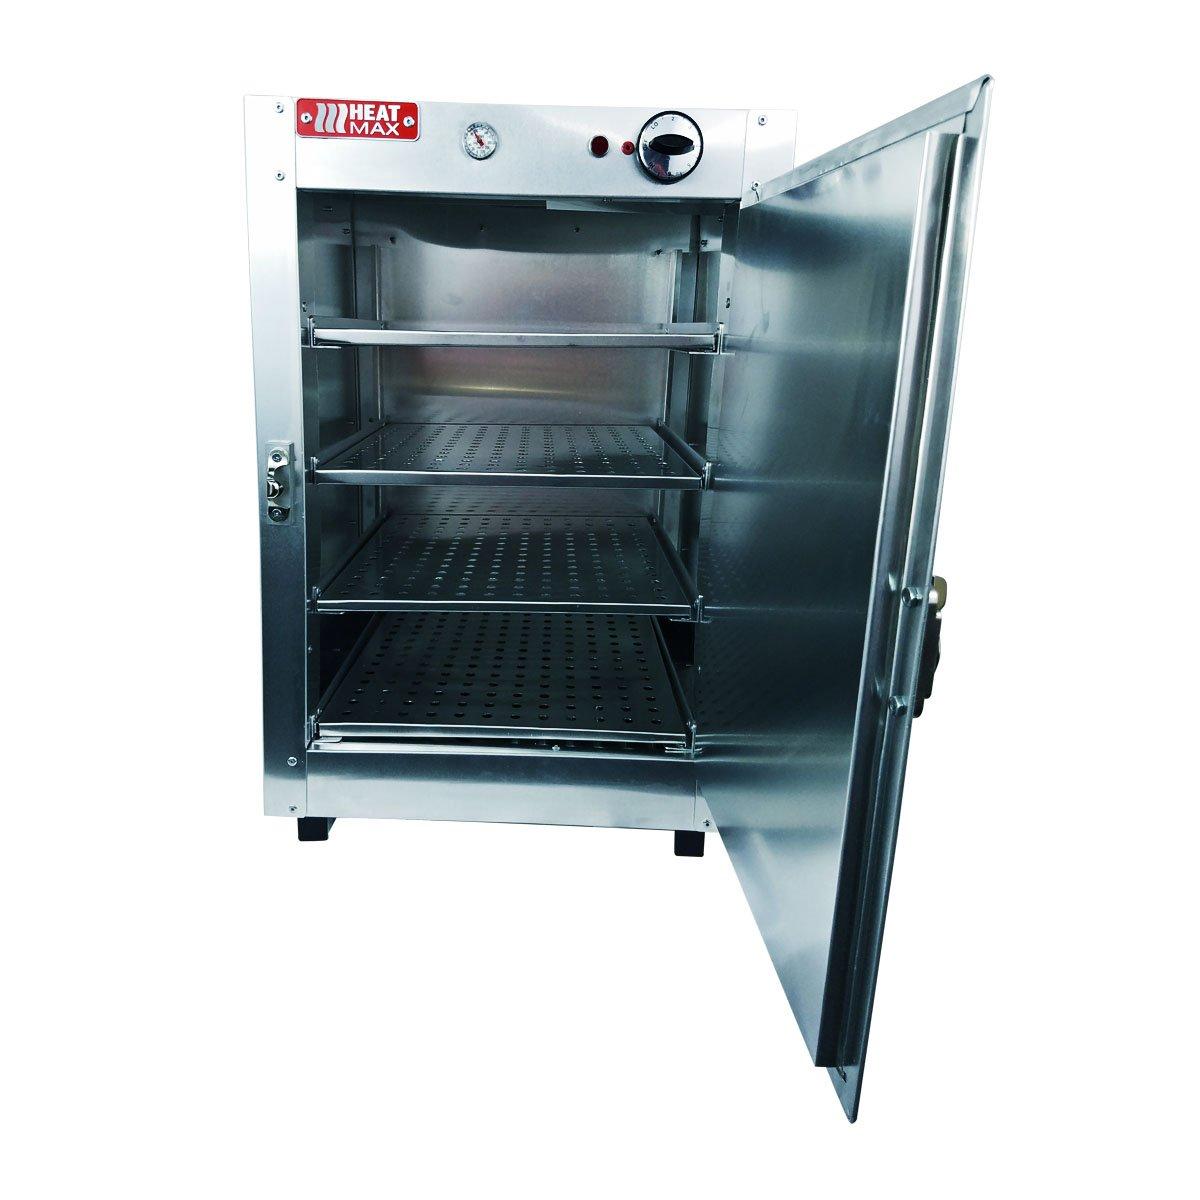 Amazon.com: HeatMax Commercial Food Pastry Warming Case Aluminum 16x16x24 Hot  Box Cabinet: Appliances